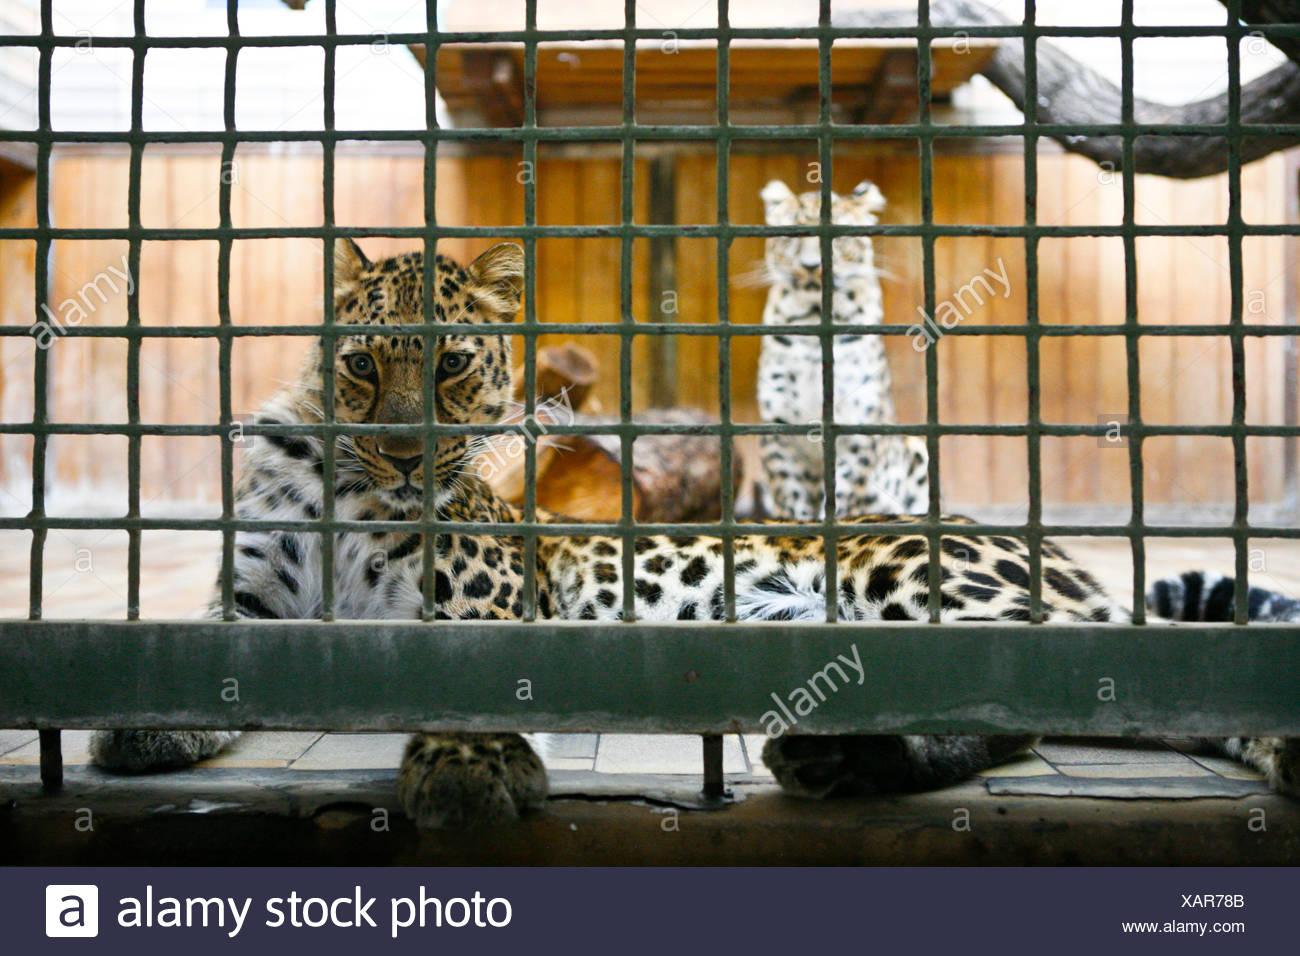 Amur Leopard (Panthera pardus orientalis) in a small cage at Tiergarten Berlin zoo, Berlin, Berlin, Germany Stock Photo